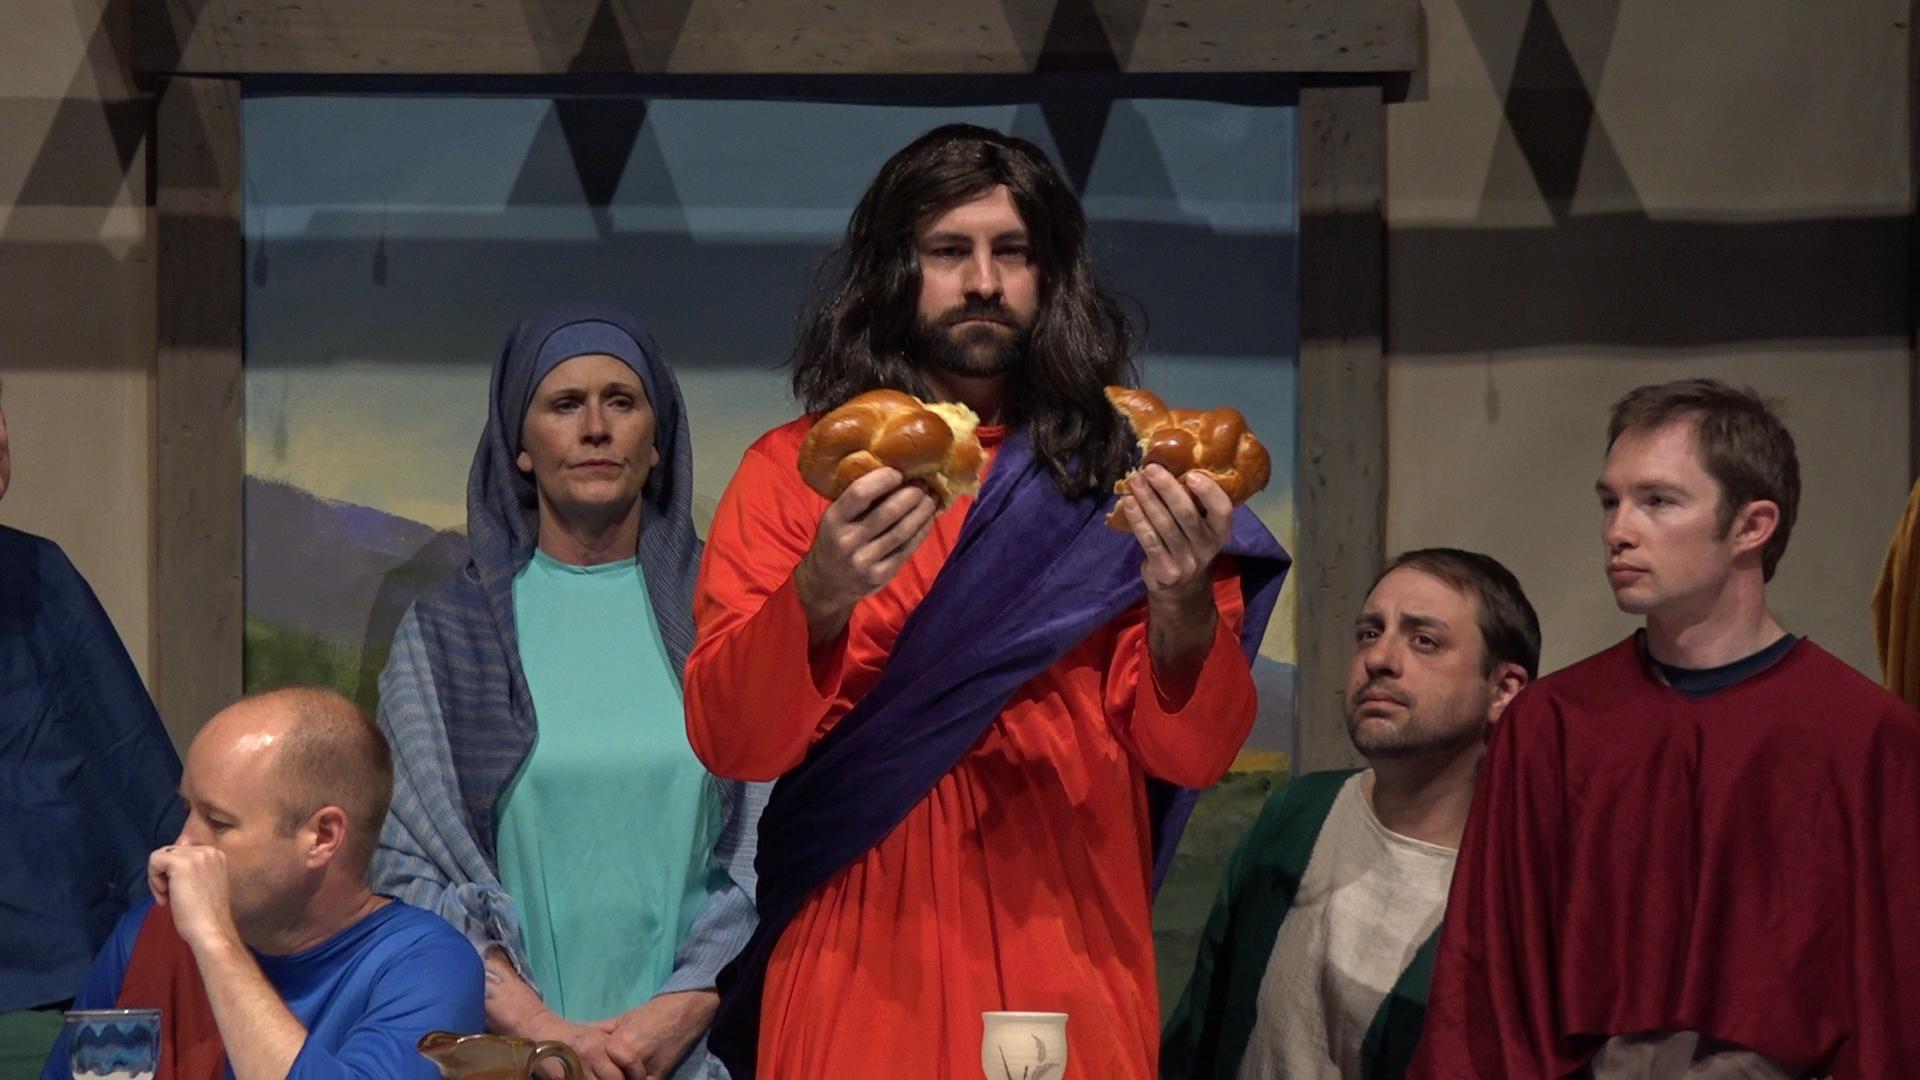 Dalton Shaffer portrays Jesus breaking the bread at the Last Supper